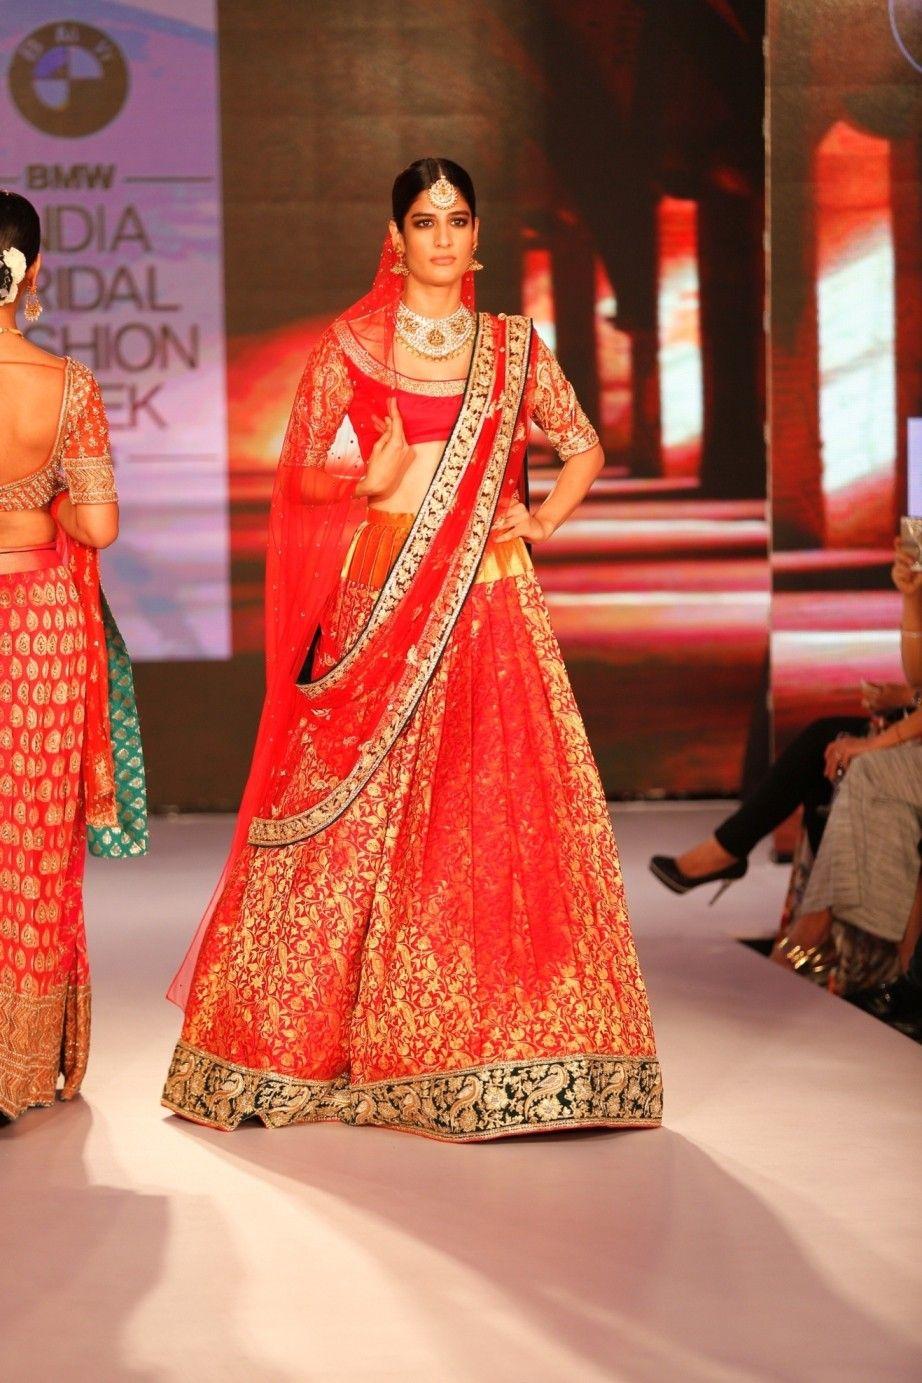 b19668648136 Red Silk Zardozi Kanjivaram Lehenga With Blouse #bandbaajaa.com  #weddinglehengas #bridallehangas #shaadilehengas #designerlehengas  #lehengacholi ...